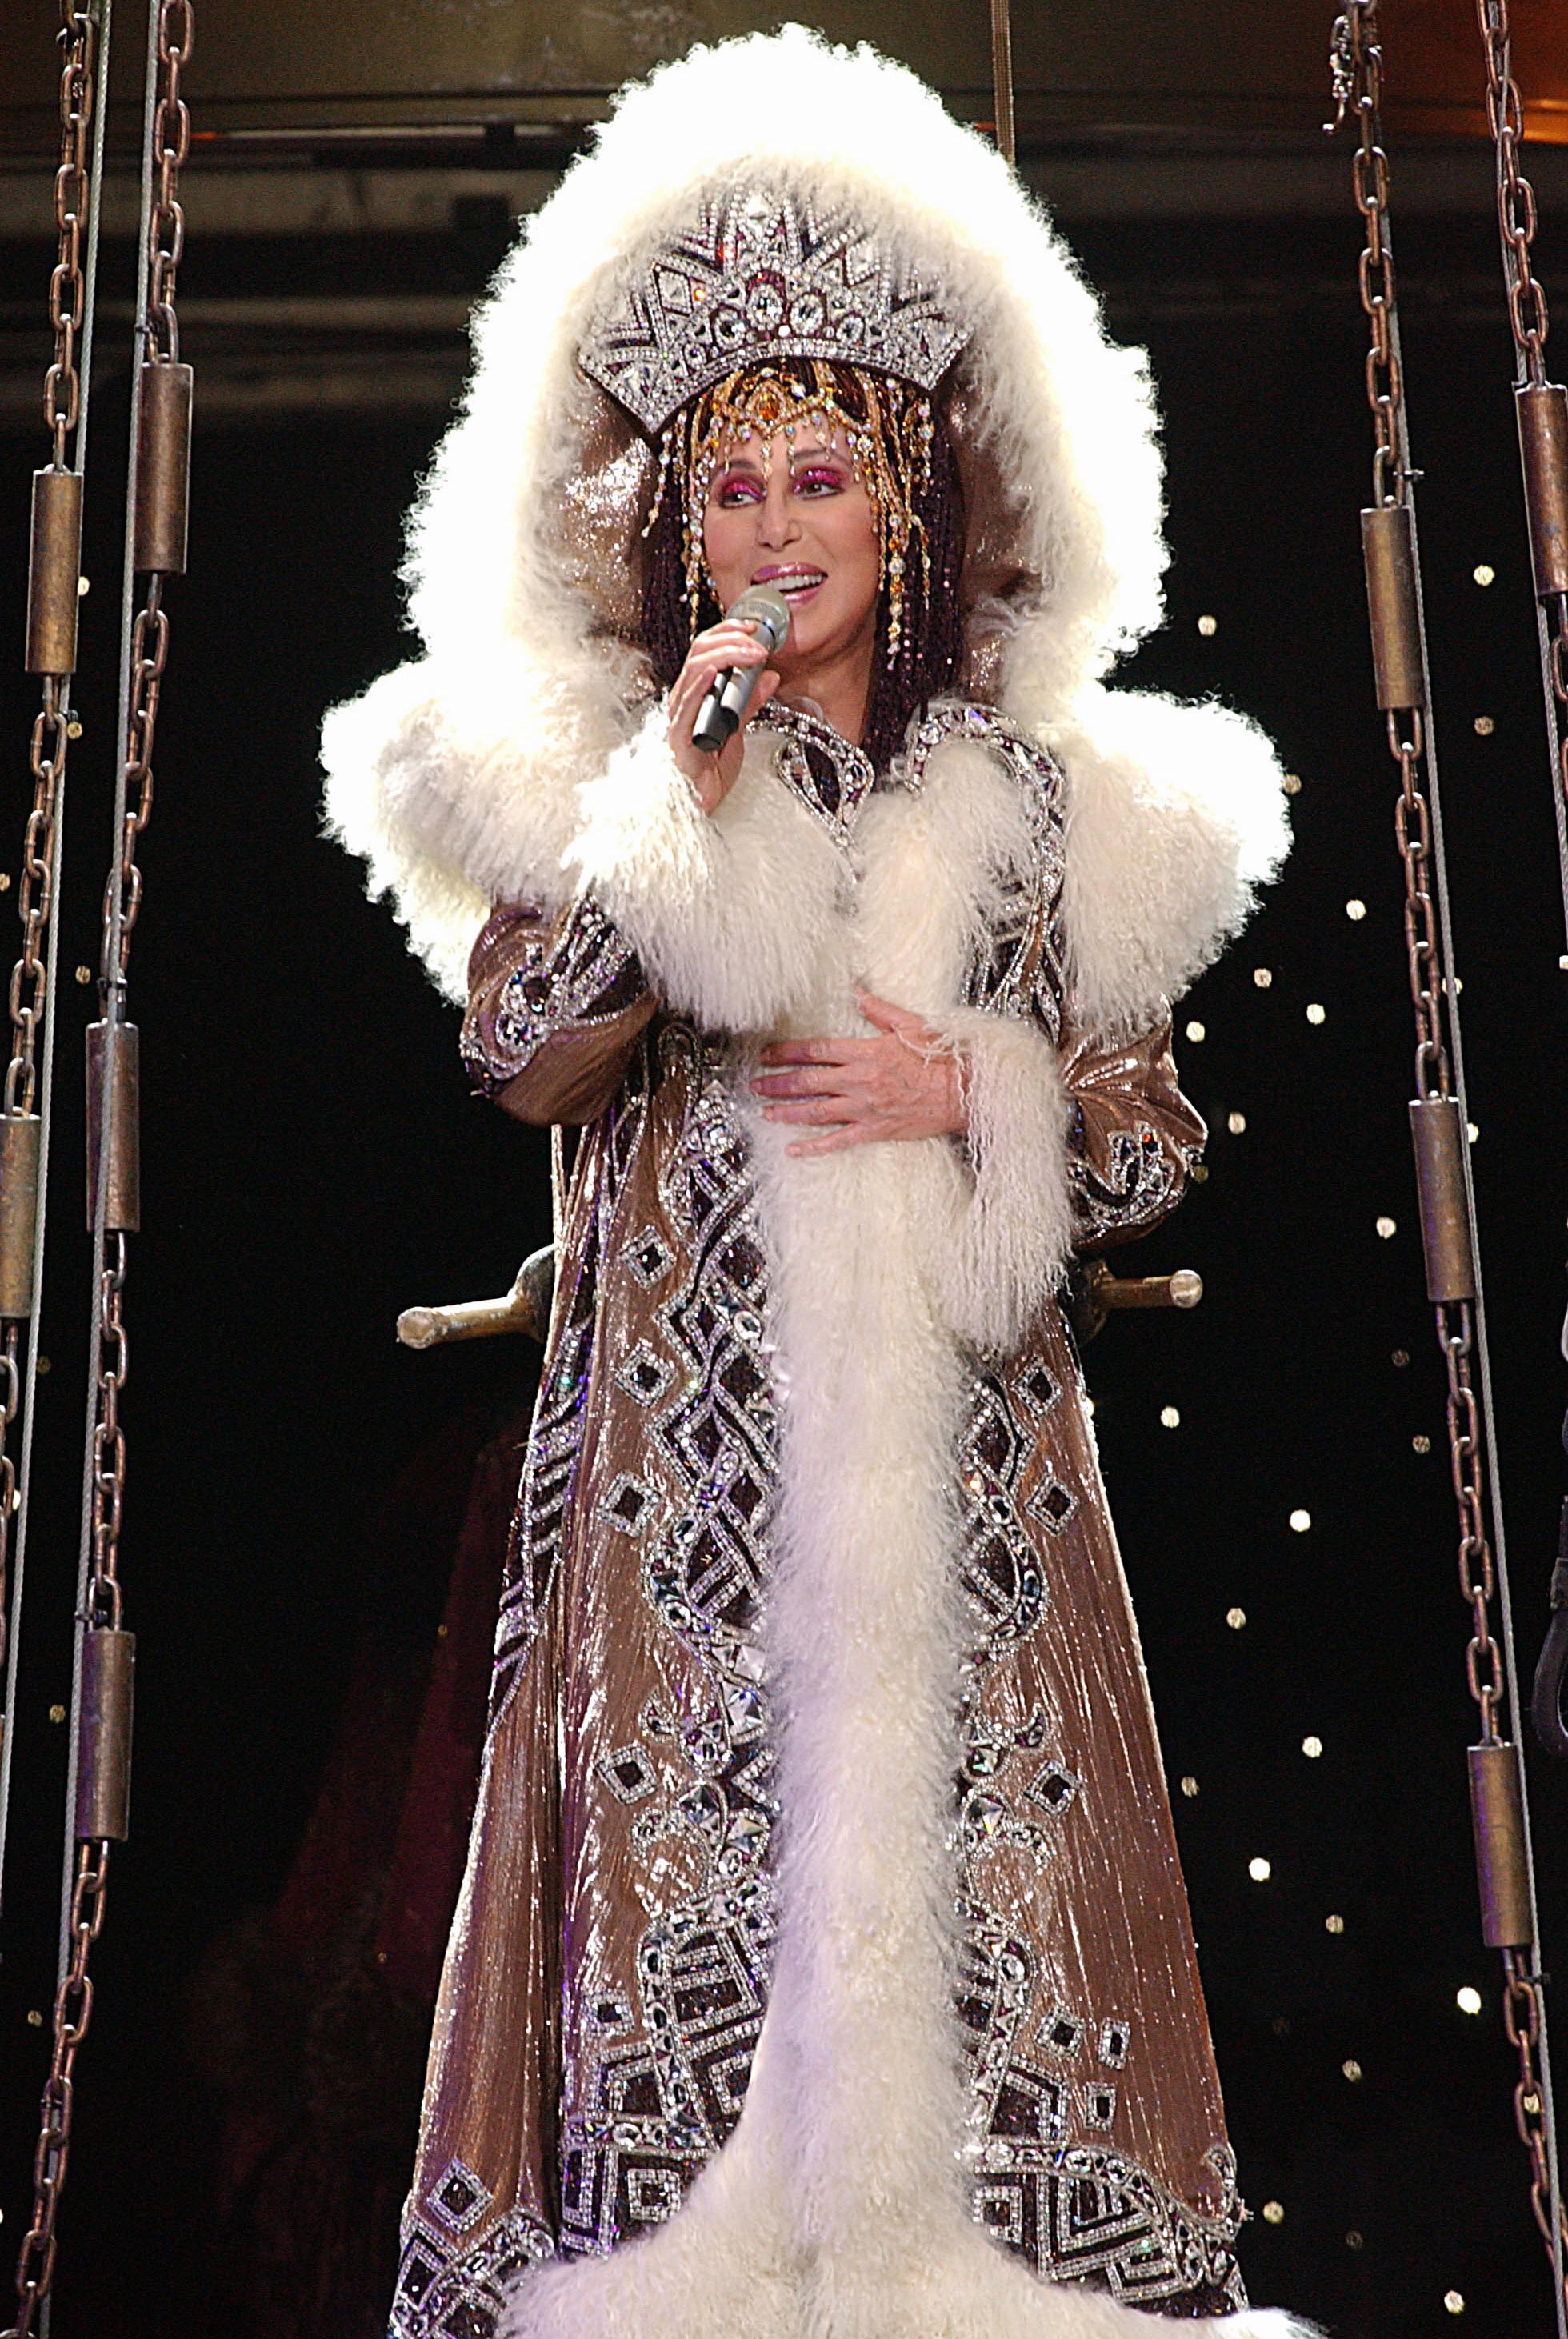 Cher performs in Australia in 2005.